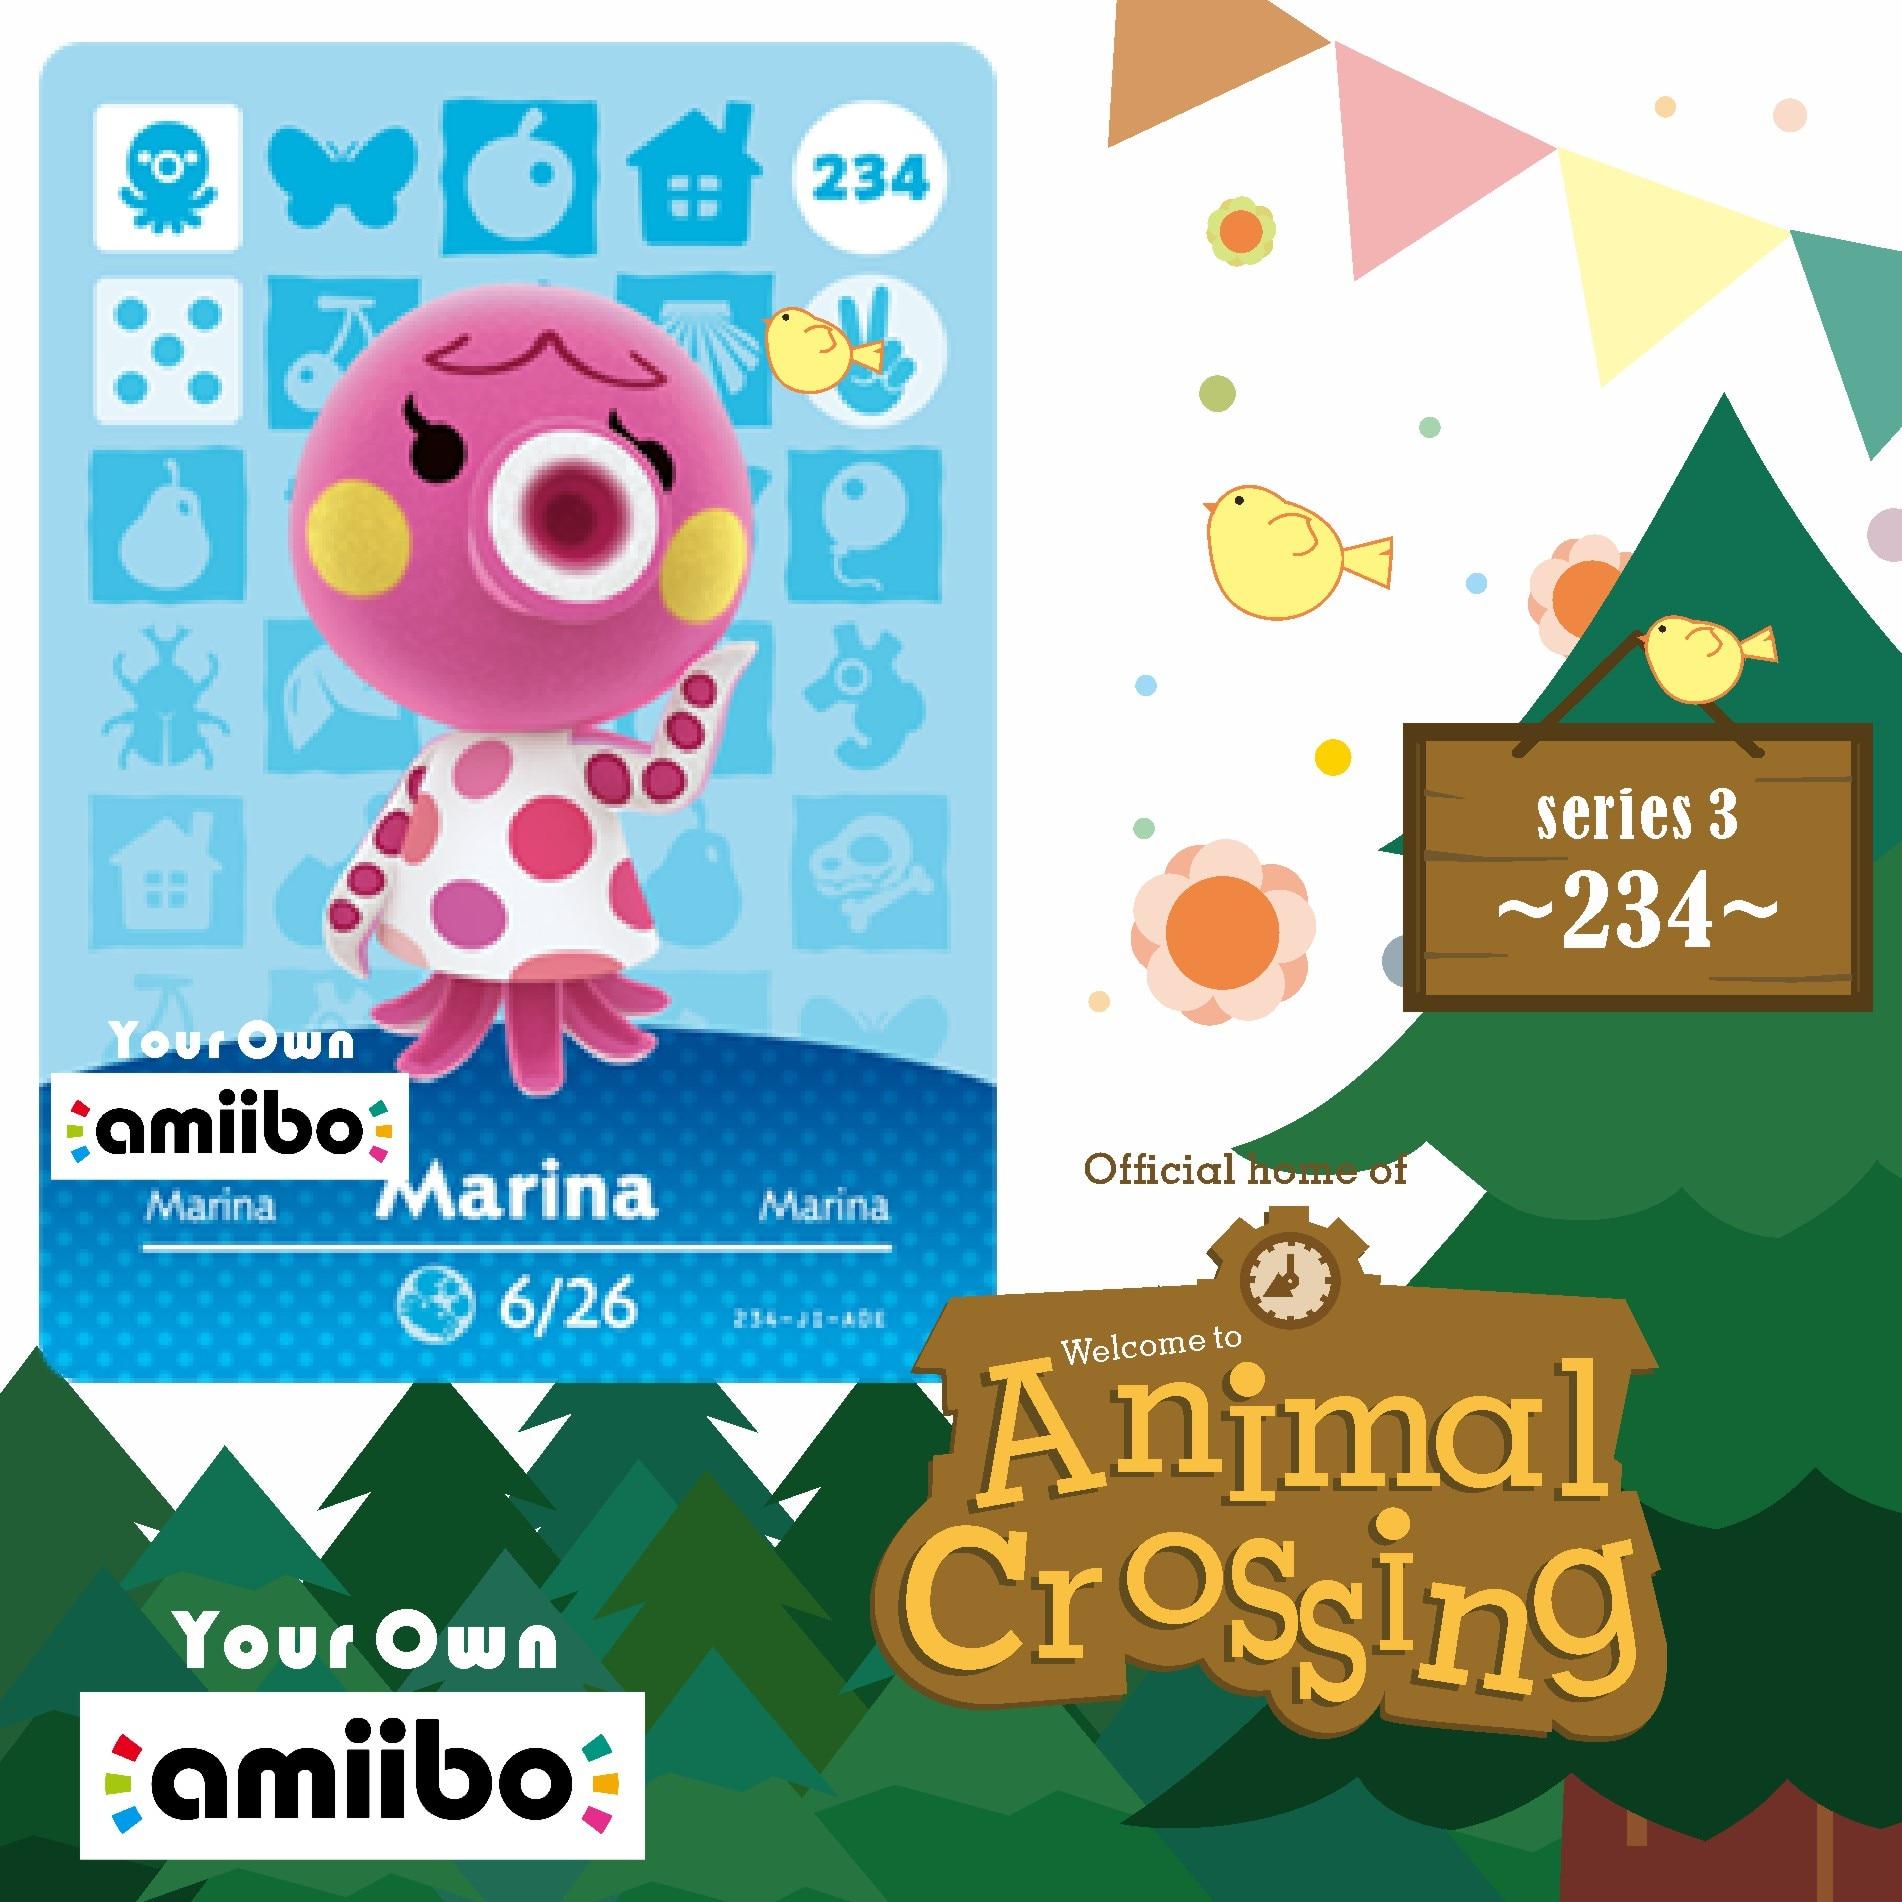 234 Animal Crossing Octopus Animal Crossing Amiibo Octopus Amiibo Marina Villager Amiibo Card New Horizons NFC Card for NS Games 1